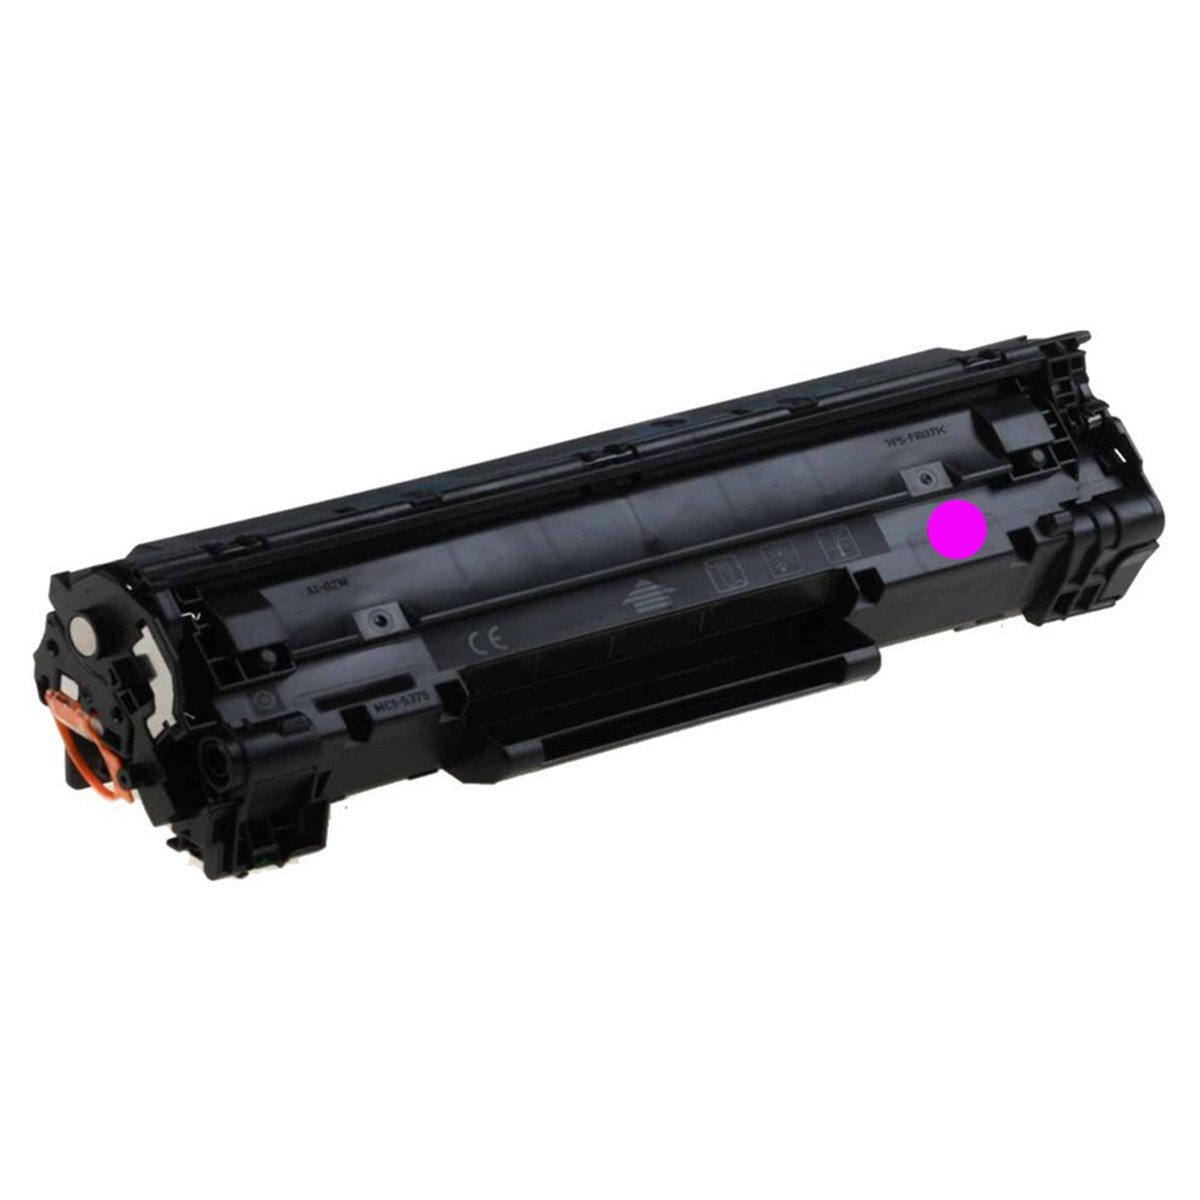 Toner Compatível HP CF403A CF403AB 201A Magenta | M252DW M277DW M252 M277 | Premium Quality 1.4k